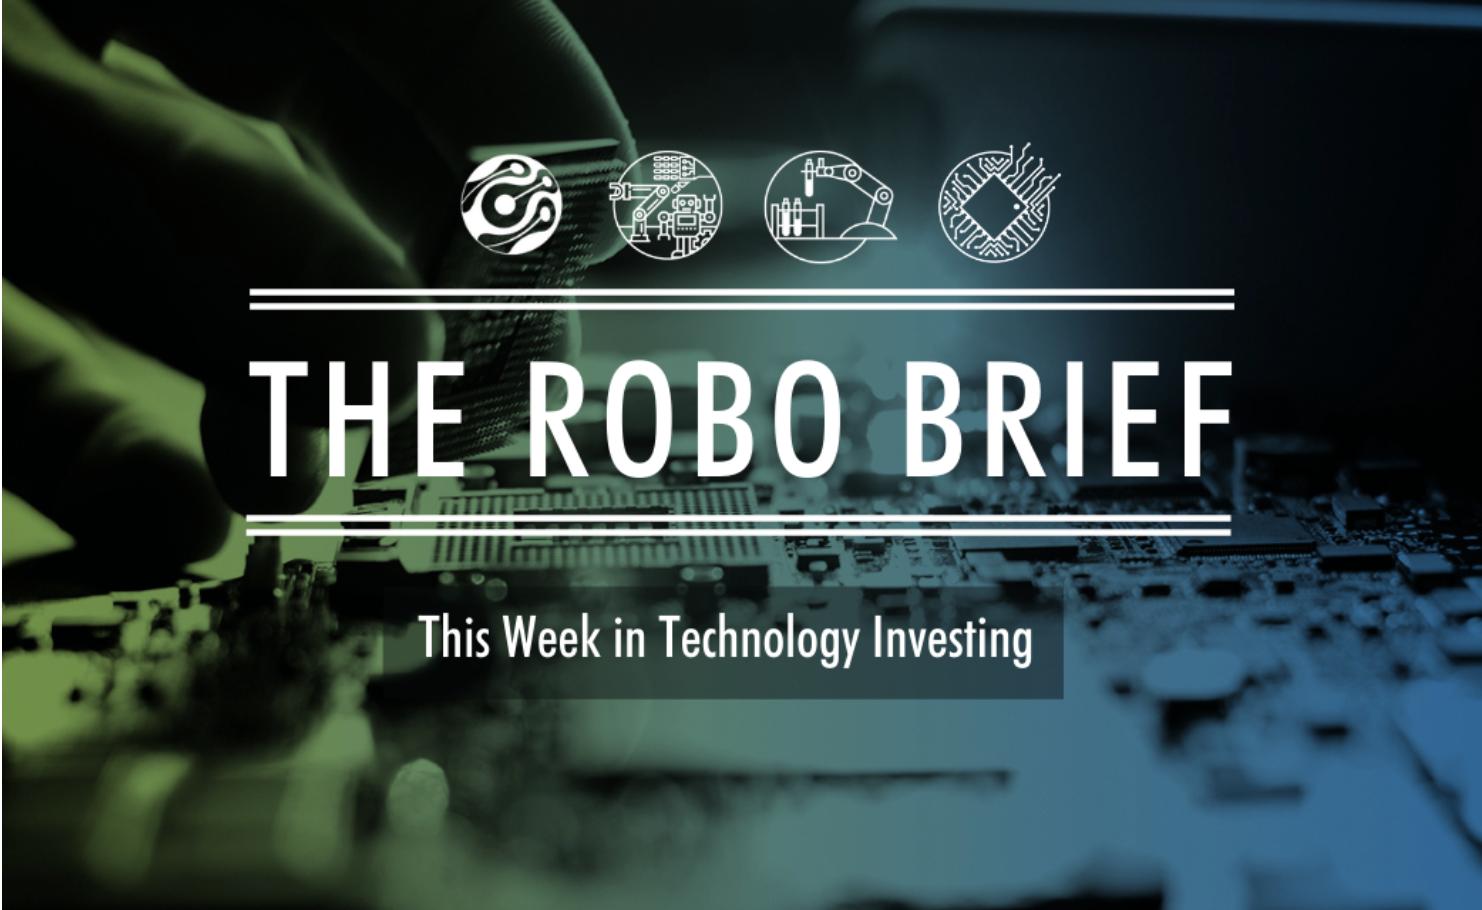 ROBO Brief: 3 Tech Companies Exceeding Investor Expectations